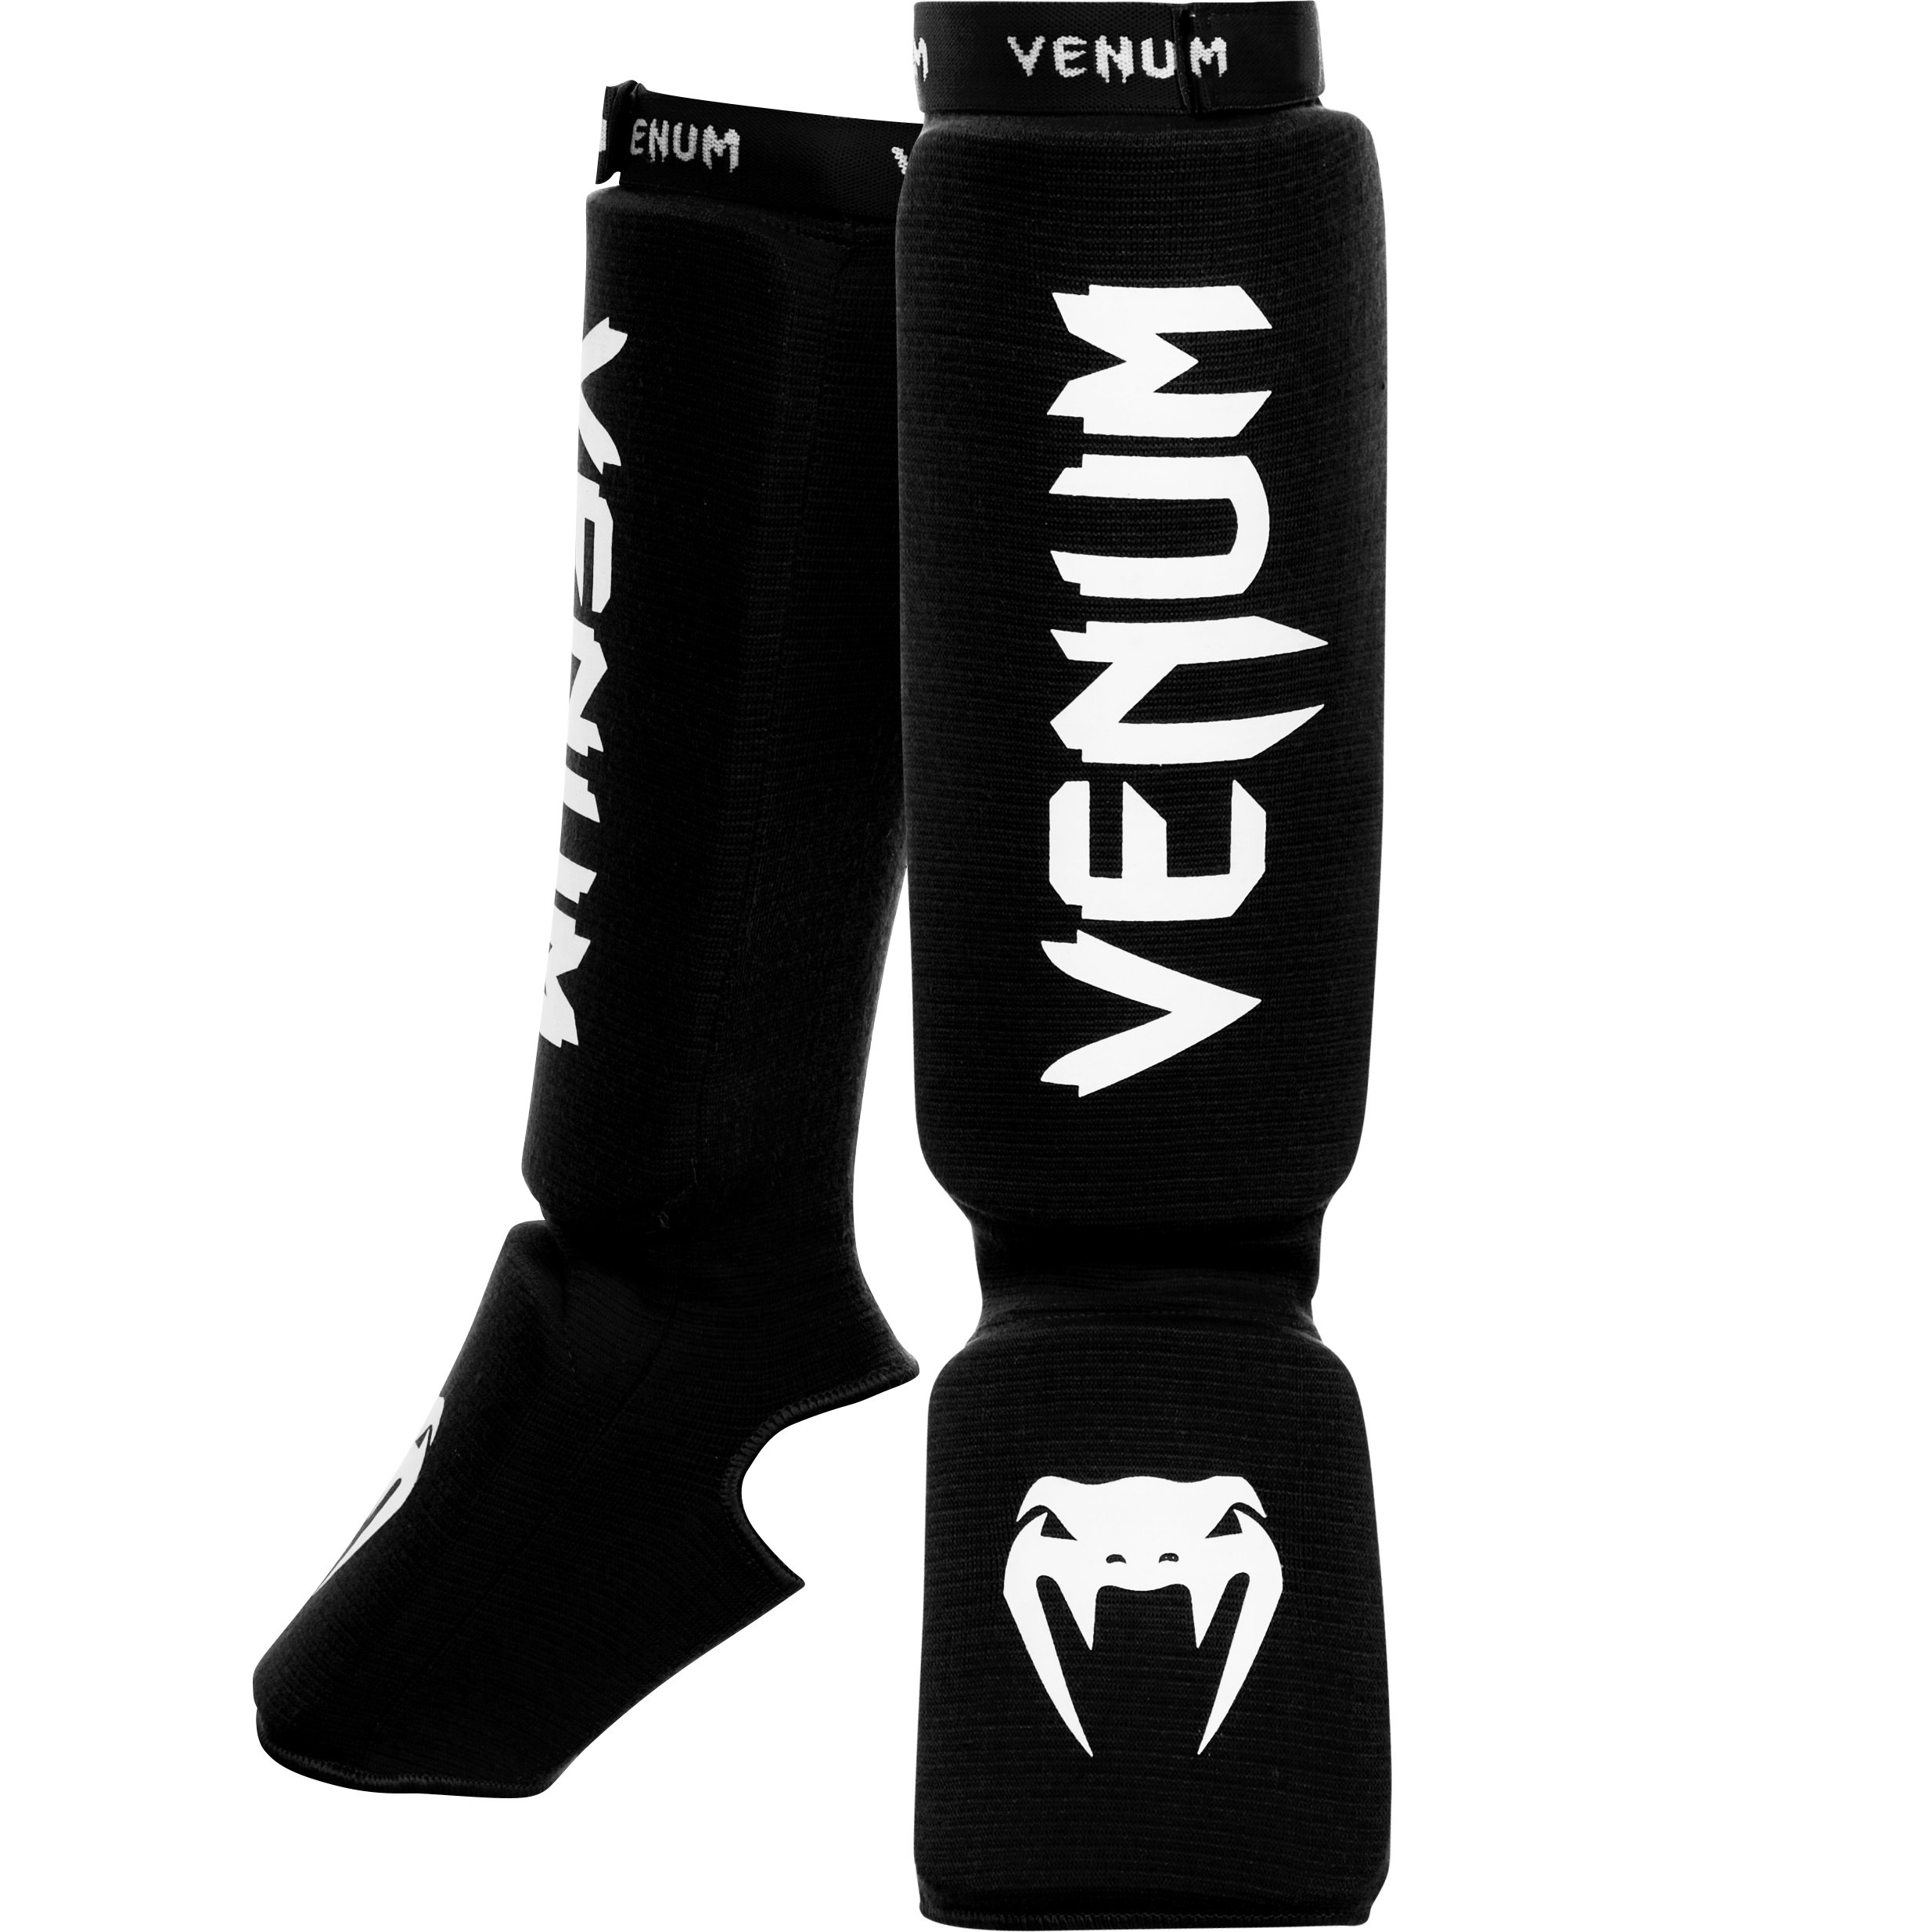 Venum ''Kontact'' Shin and Instep Guards, Black